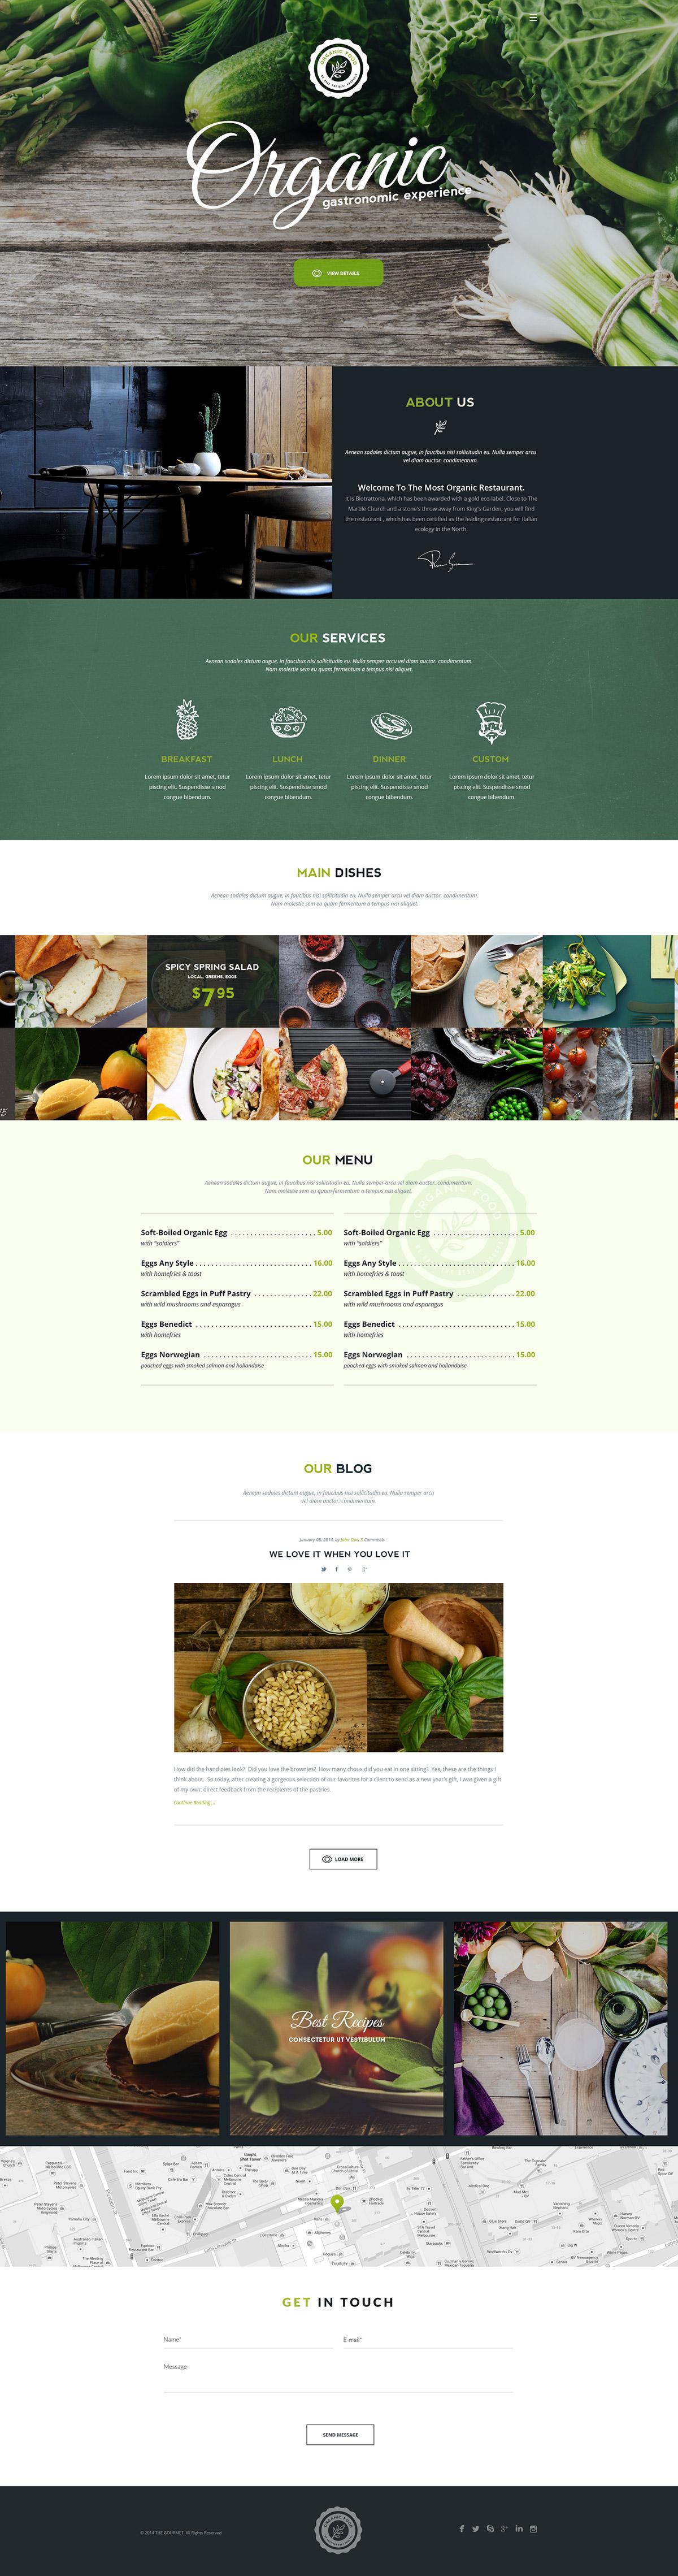 Organic – Food&Restaurant Theme on Behance